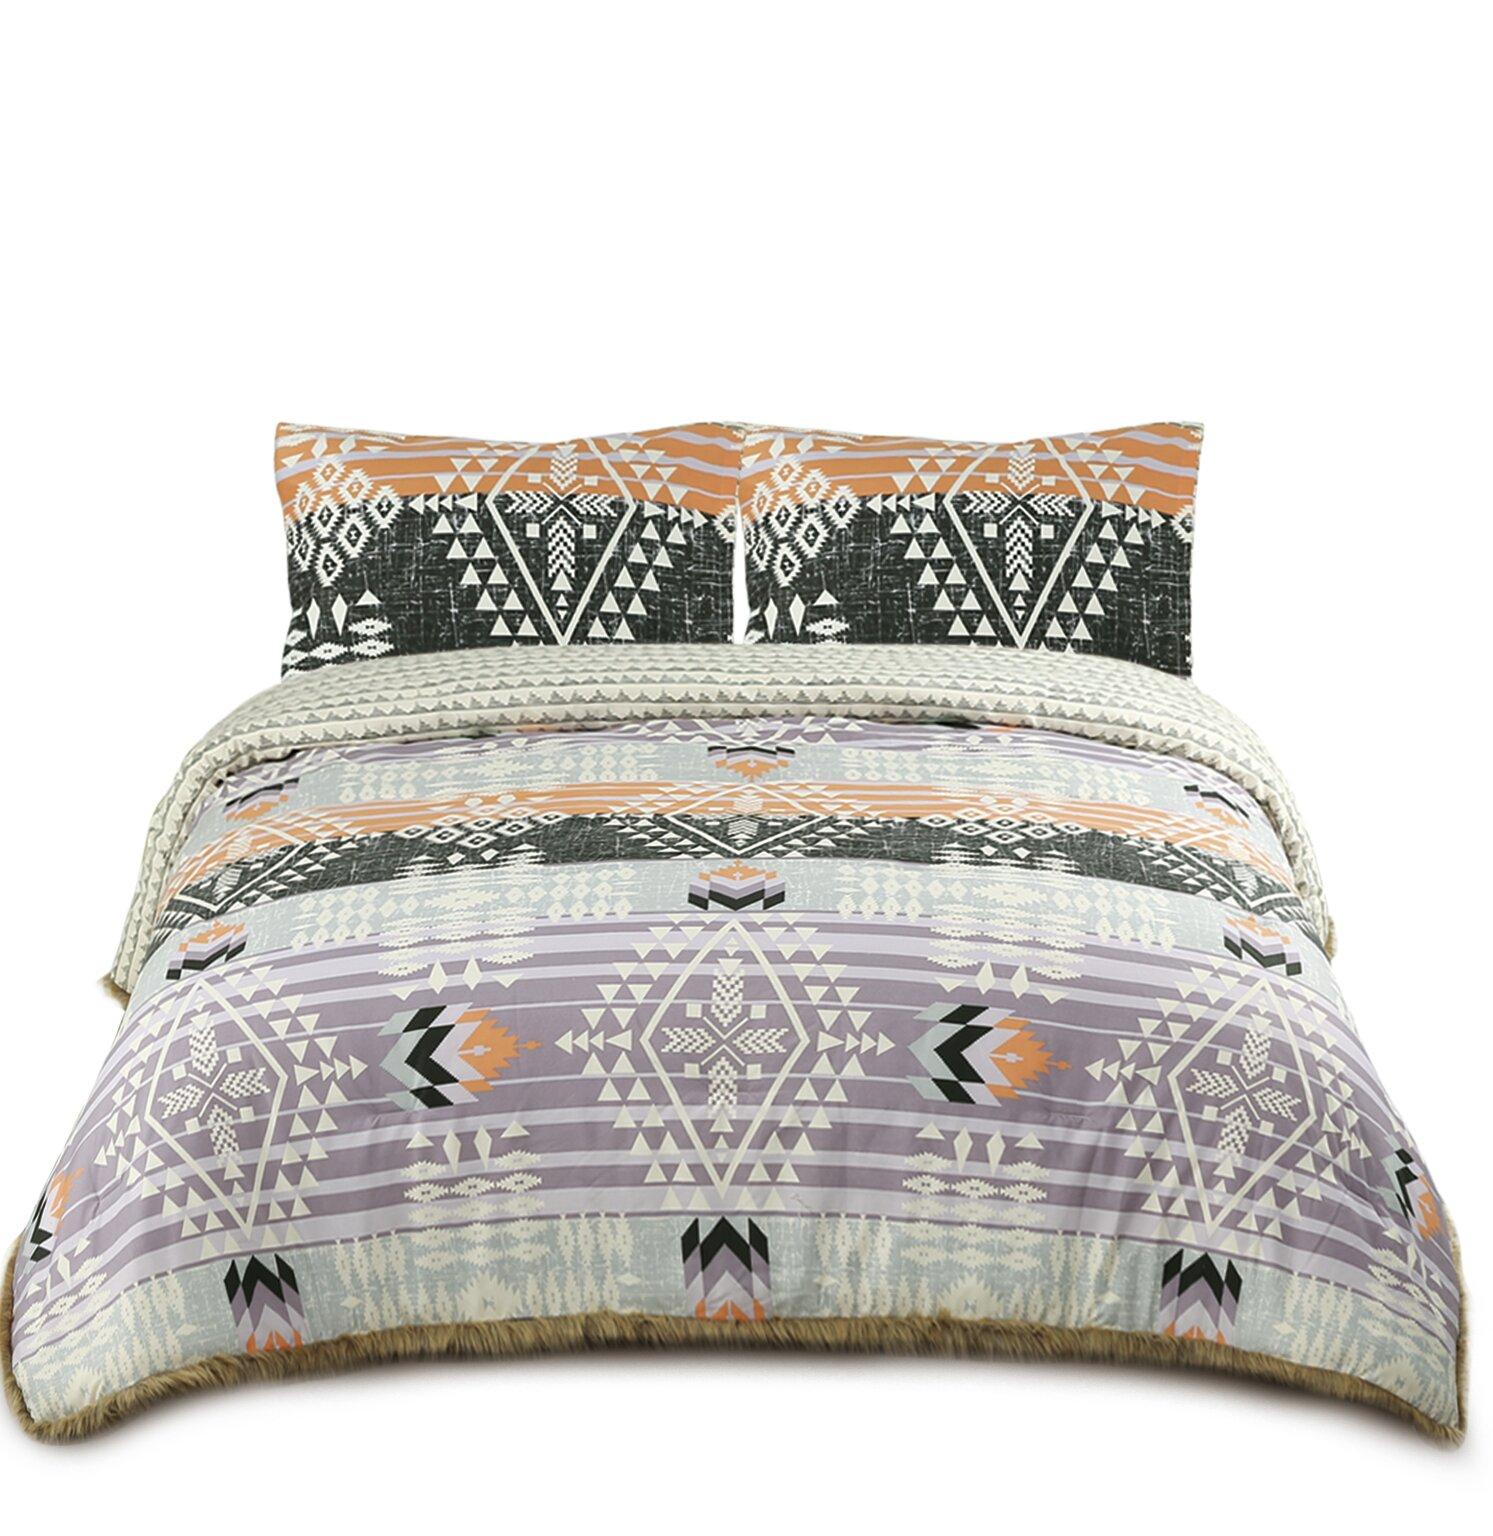 Foundry Select Clinkscales Geometric Comforter Set Reviews Wayfair